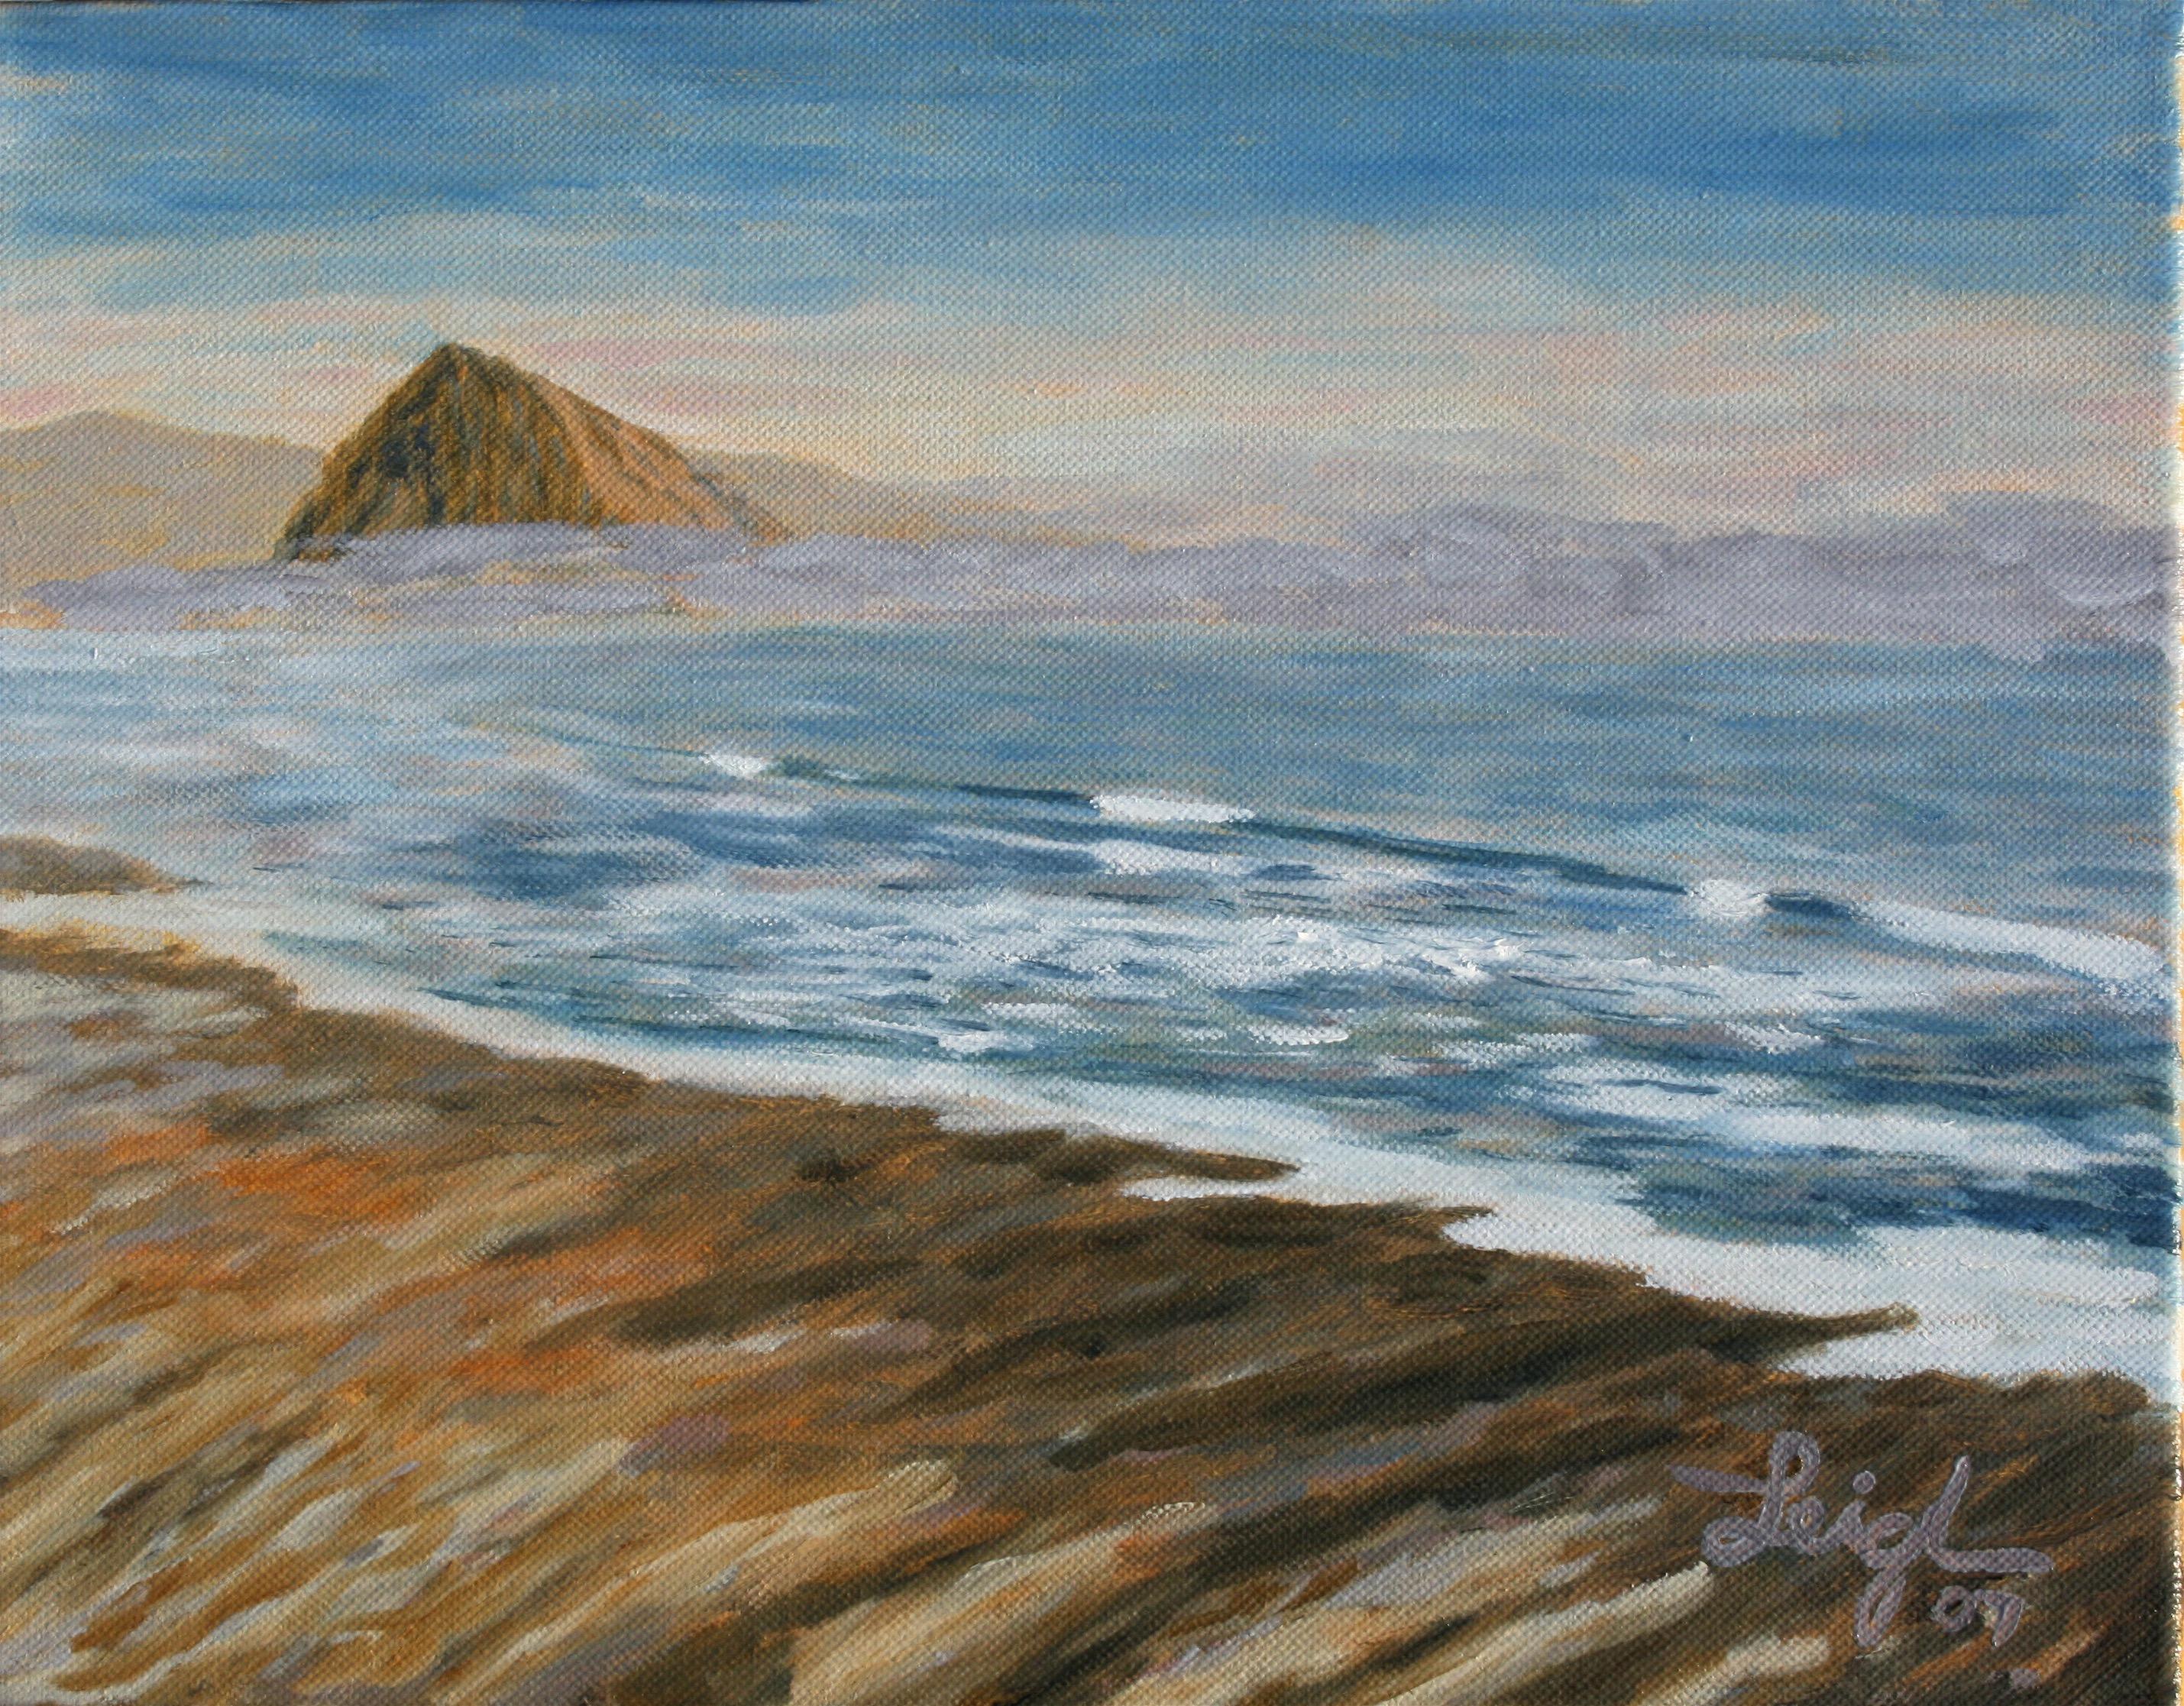 Calm sketch  ~   William Jacobson, Murrieta, CA 2007  •  14 x 11